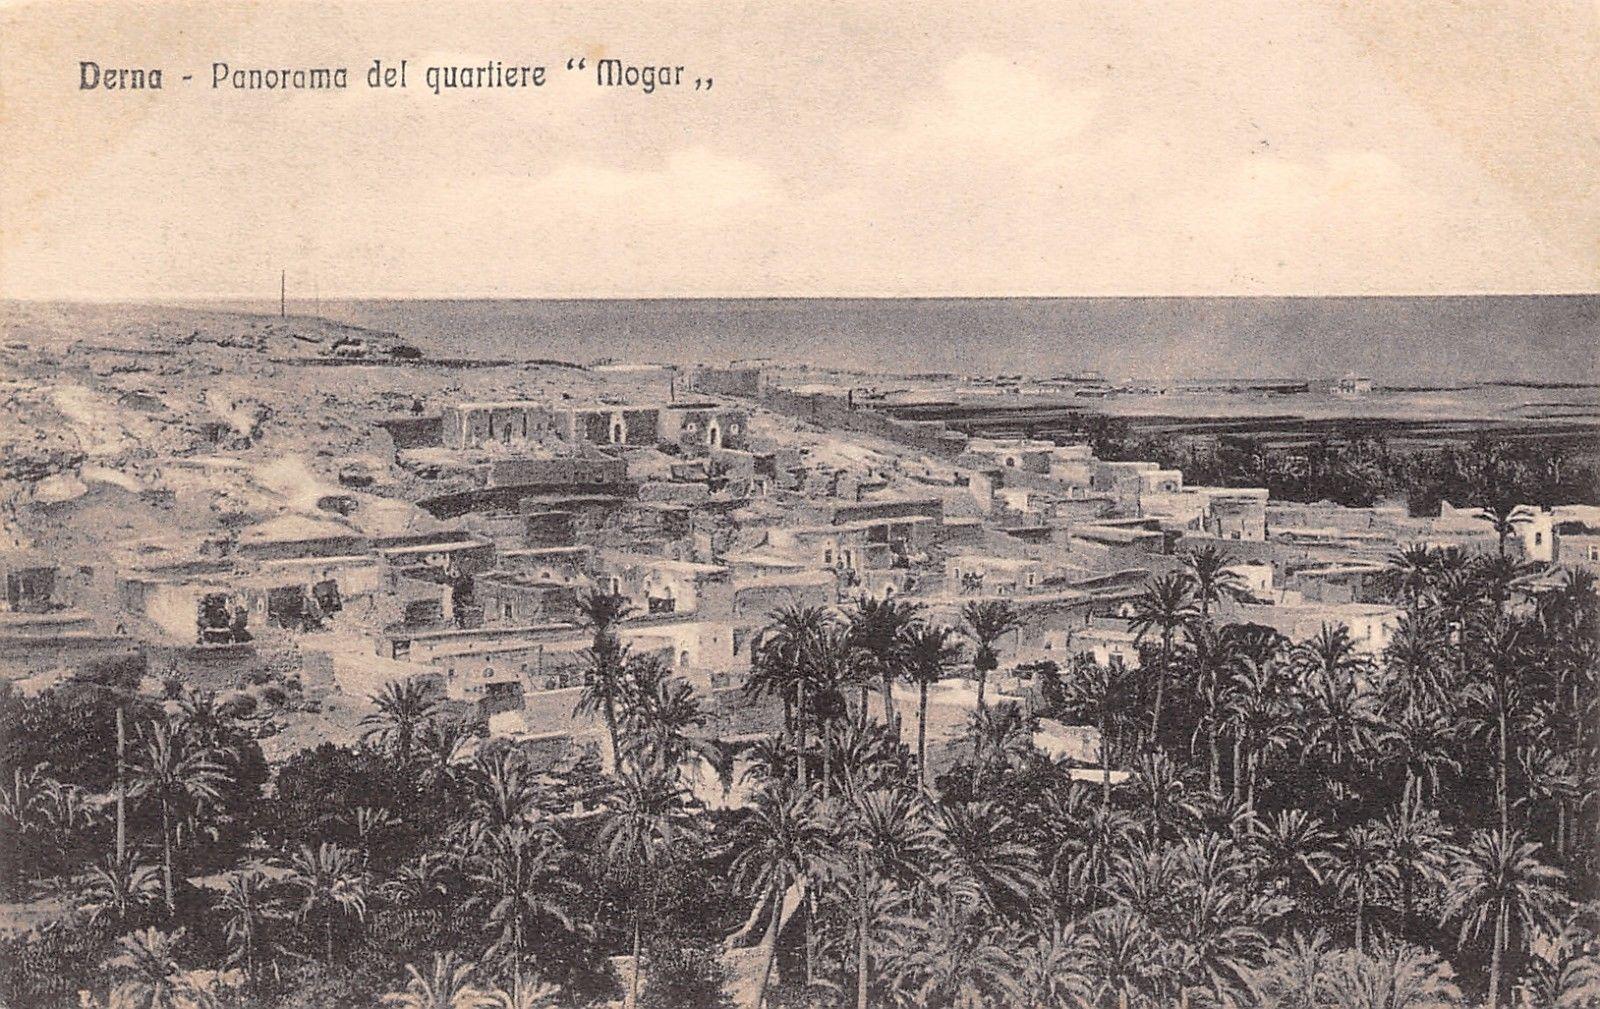 Postcard picture of Derna 1942